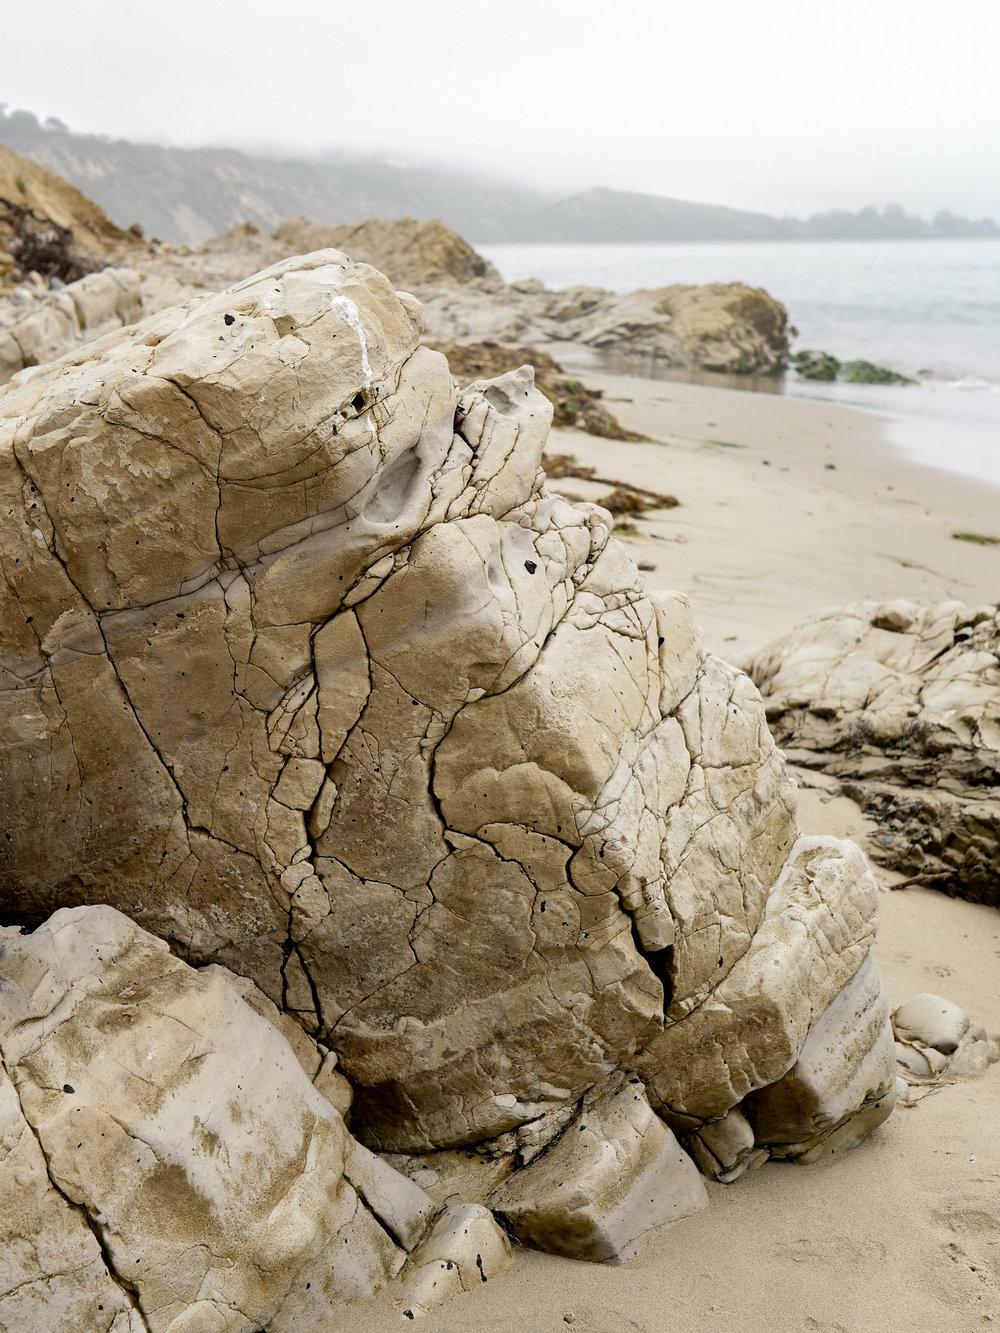 Geological wonderment at Carpinteria Bluffs Nature Preserve.